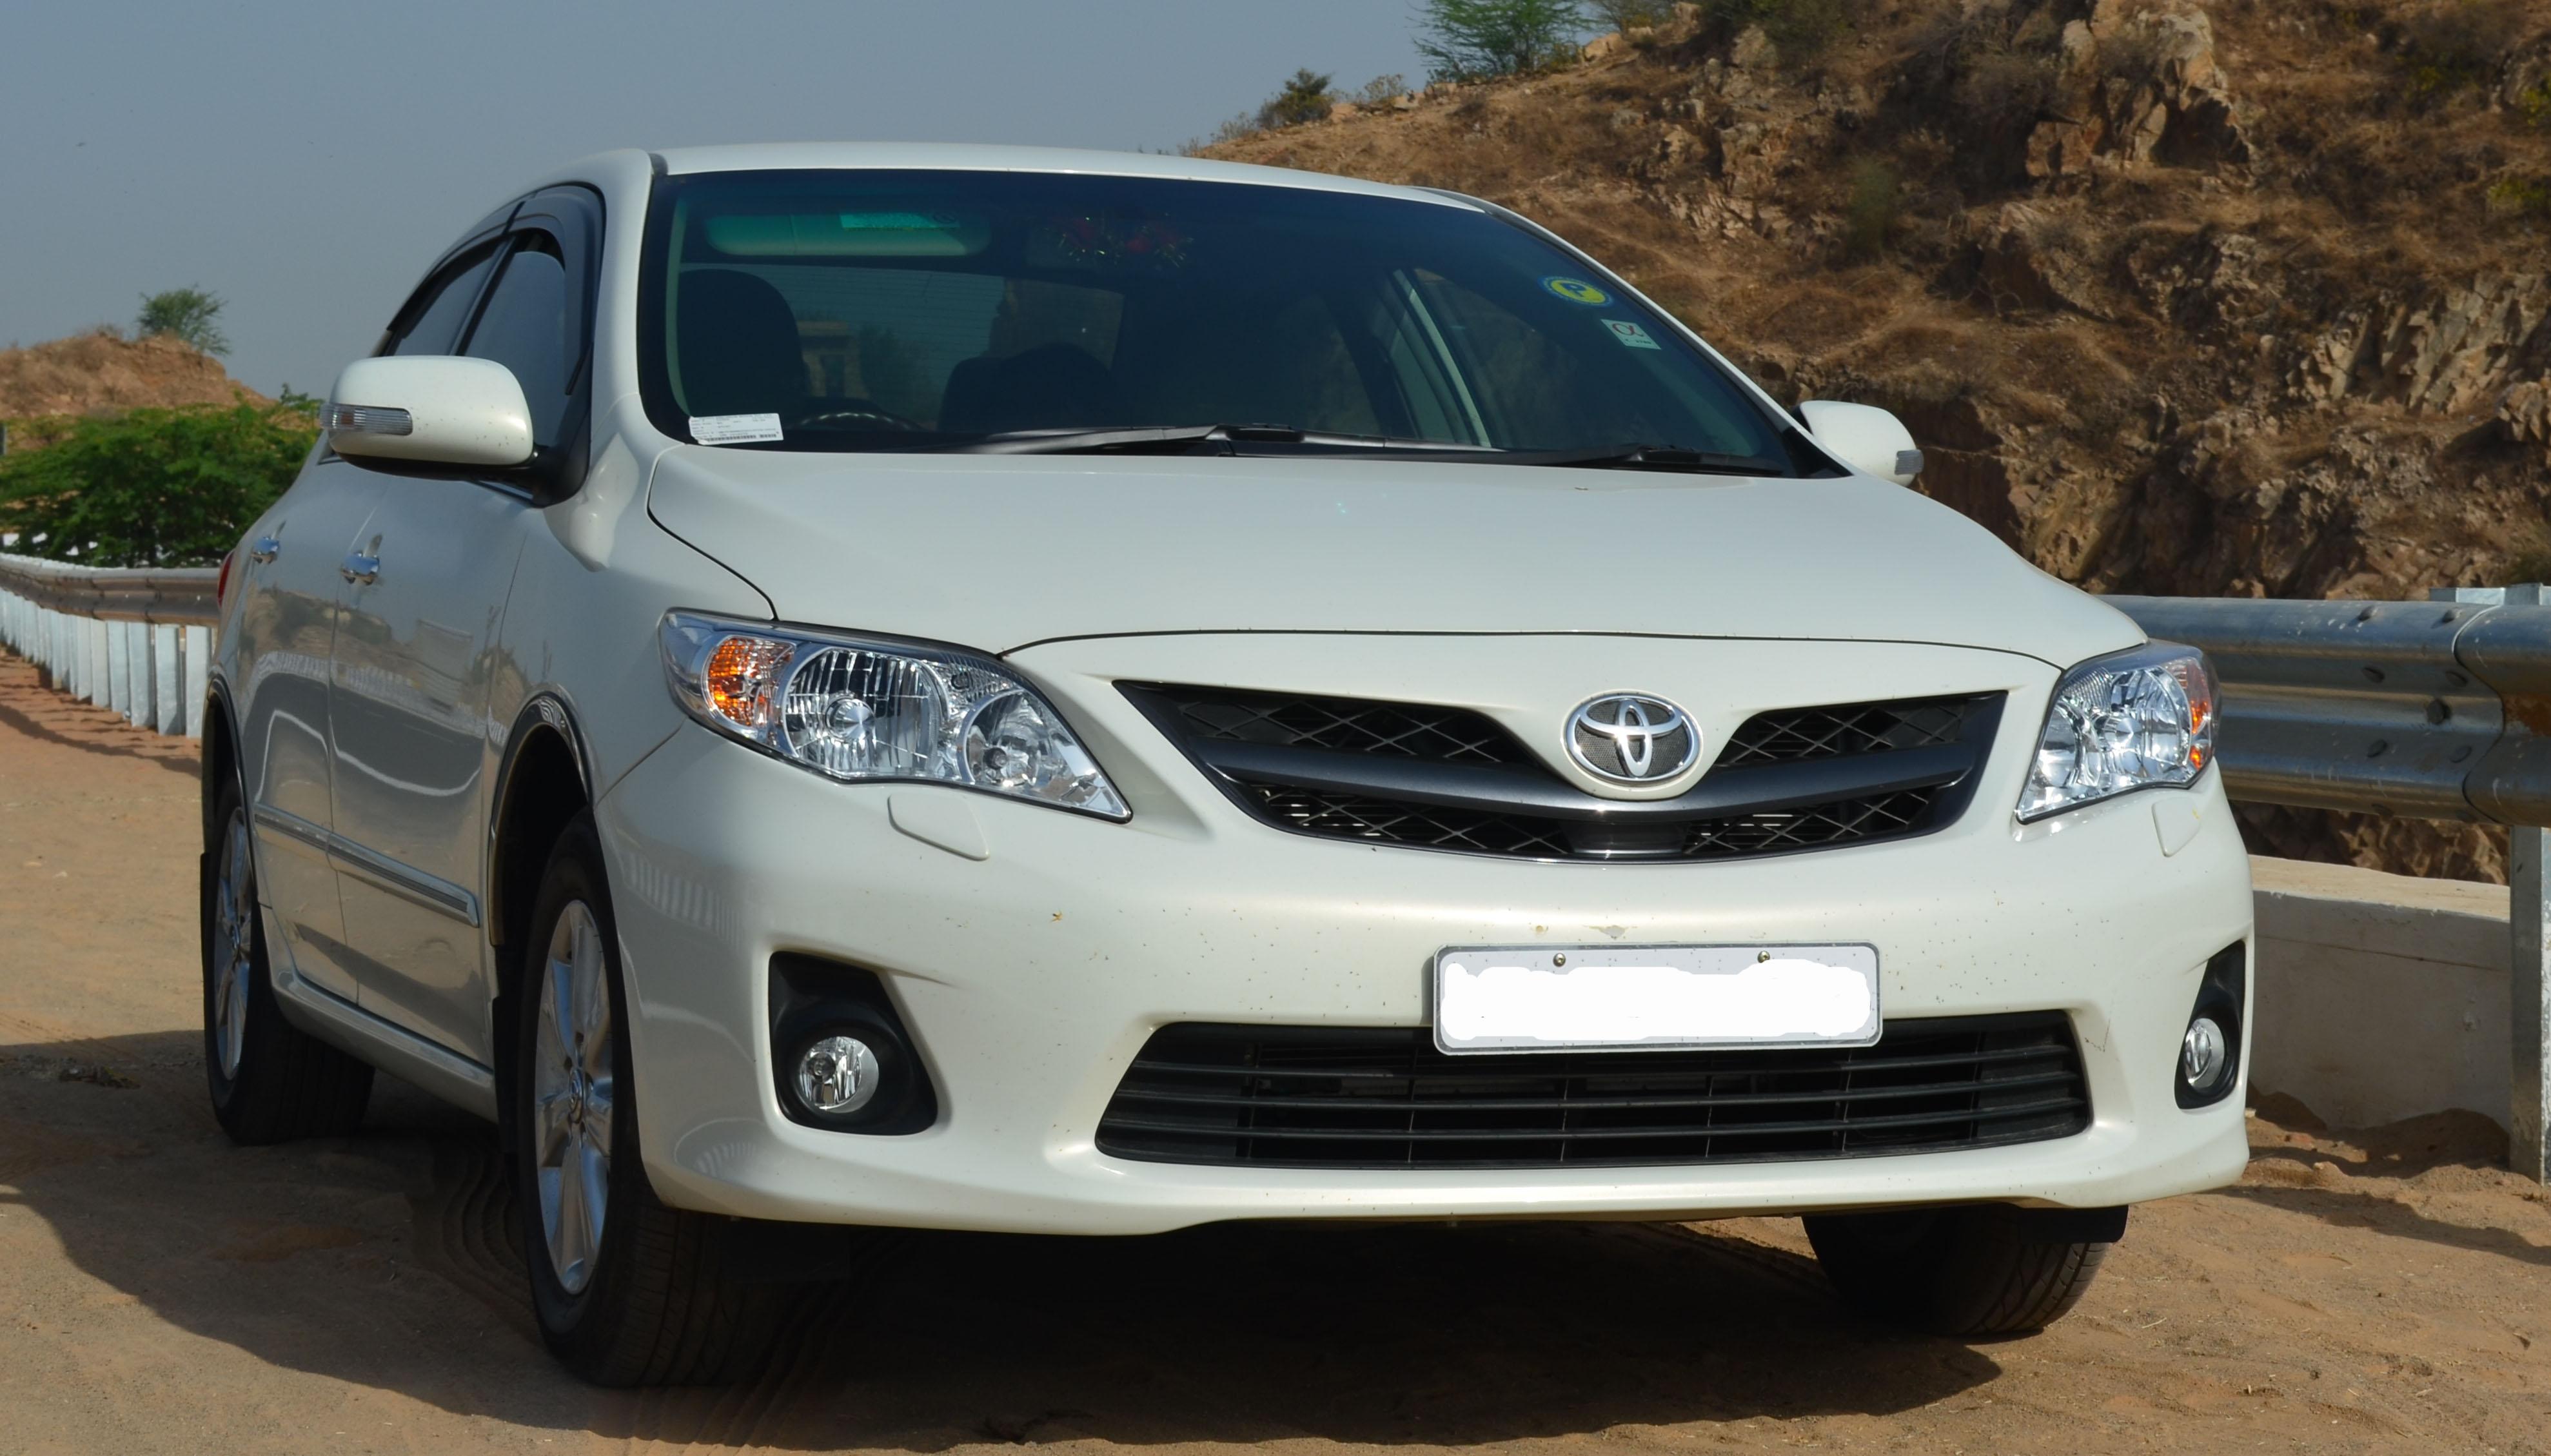 Fantastic car toyota corolla altis diesel d4dgl consumer review mouthshut com